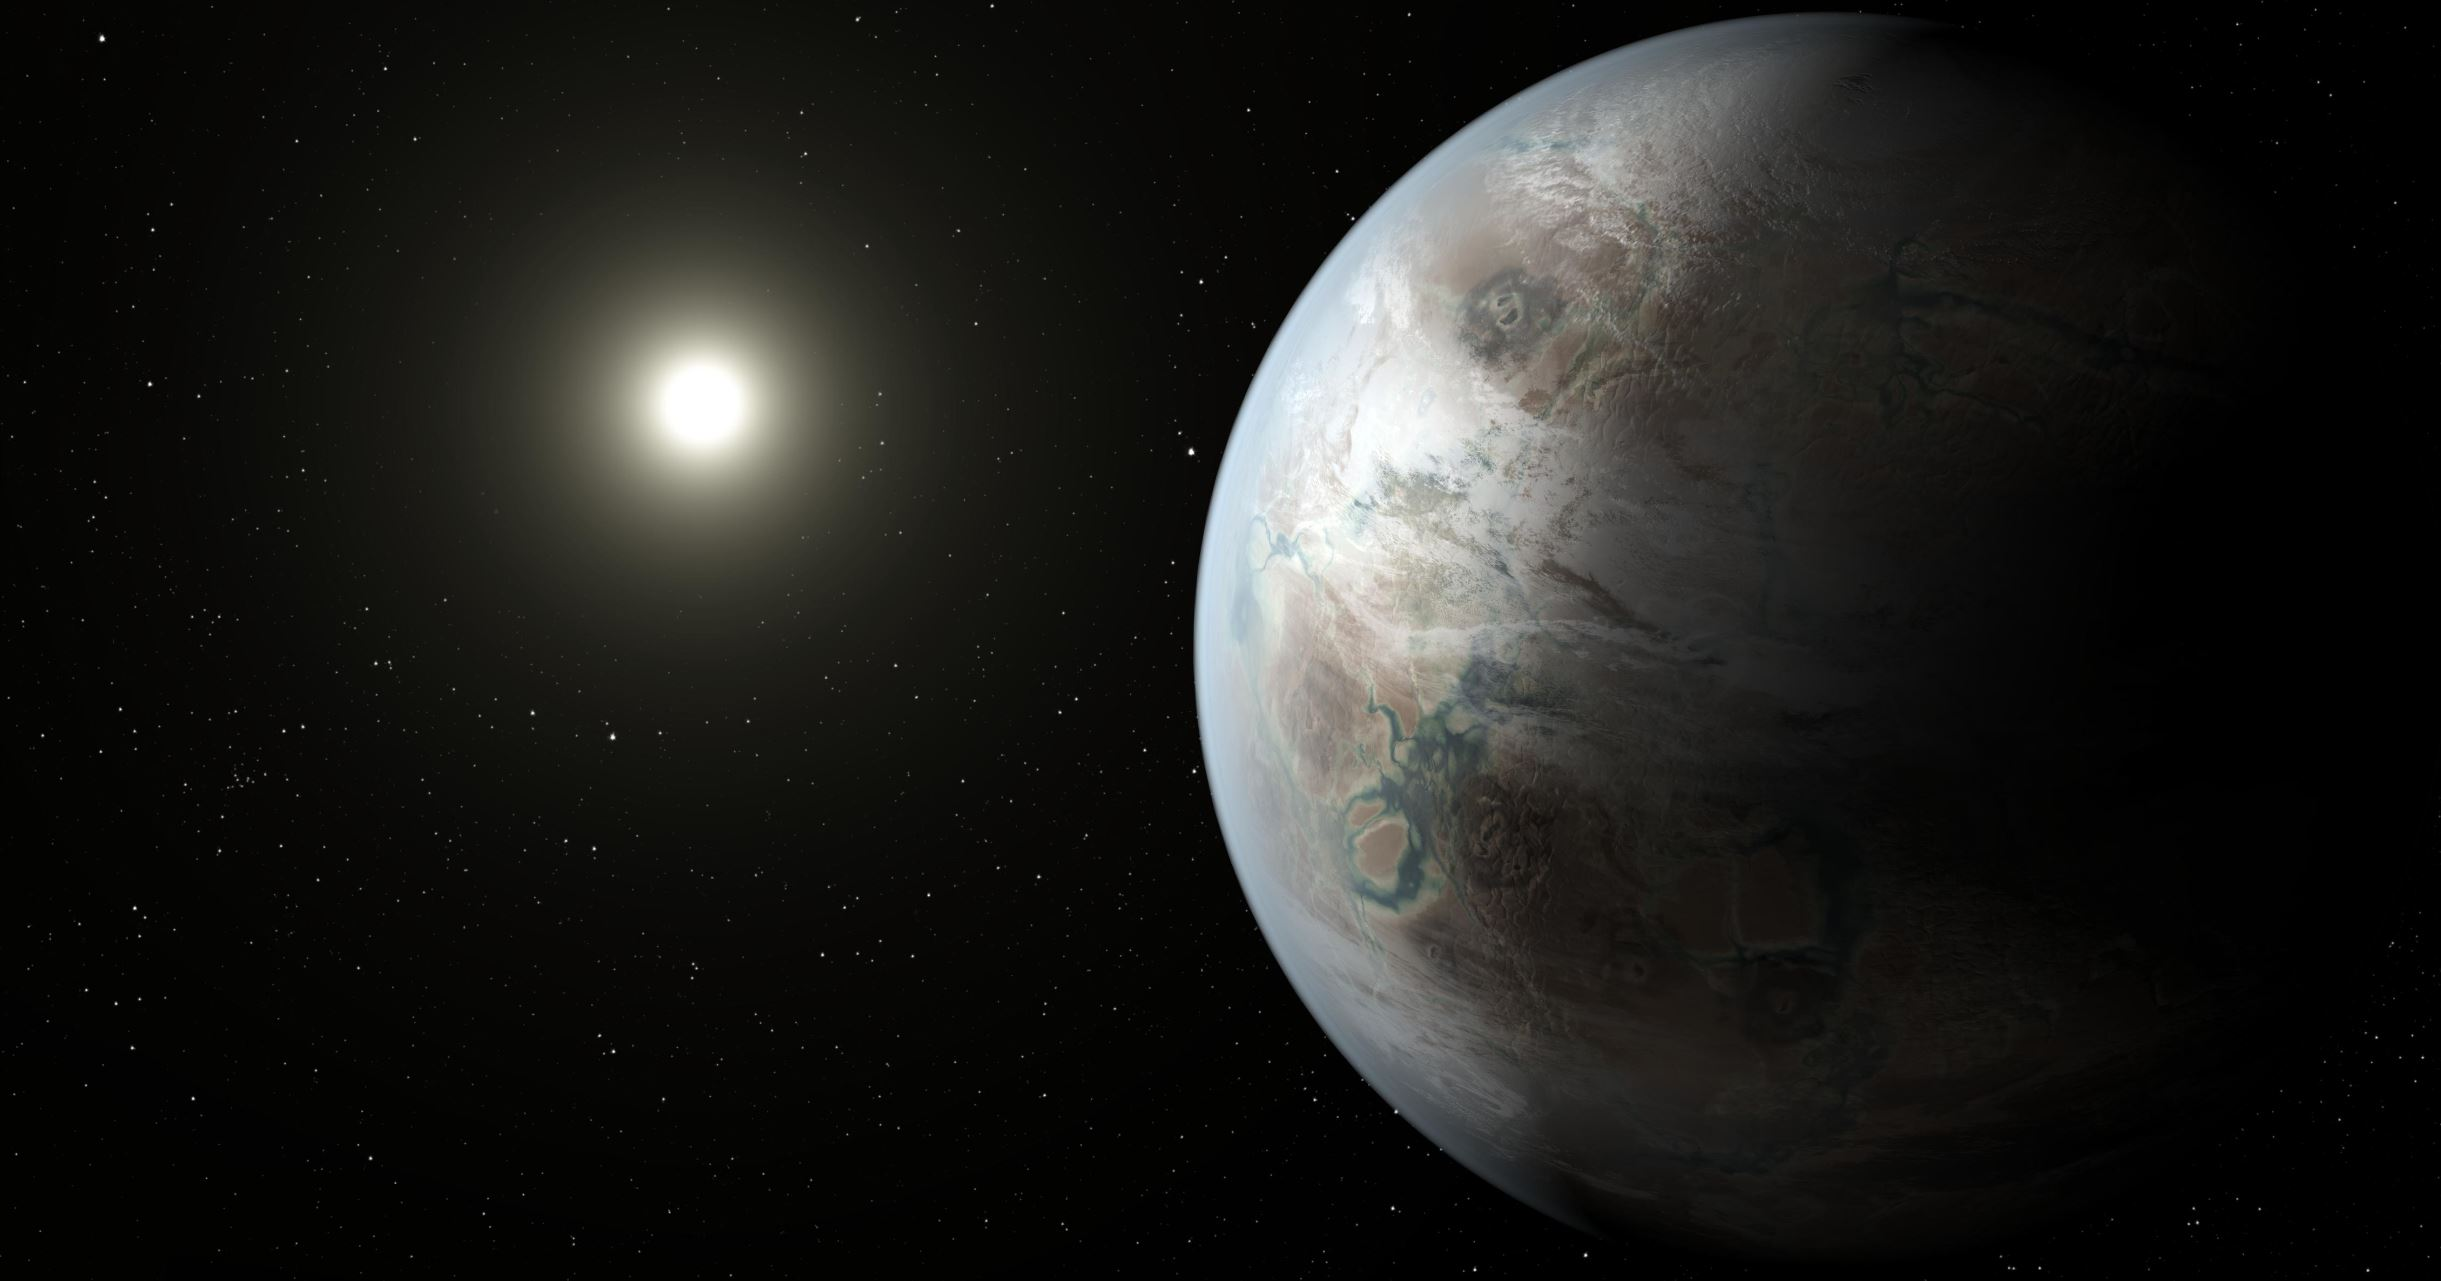 An artist's illustration of an exoplanet. - Image credit: NASA